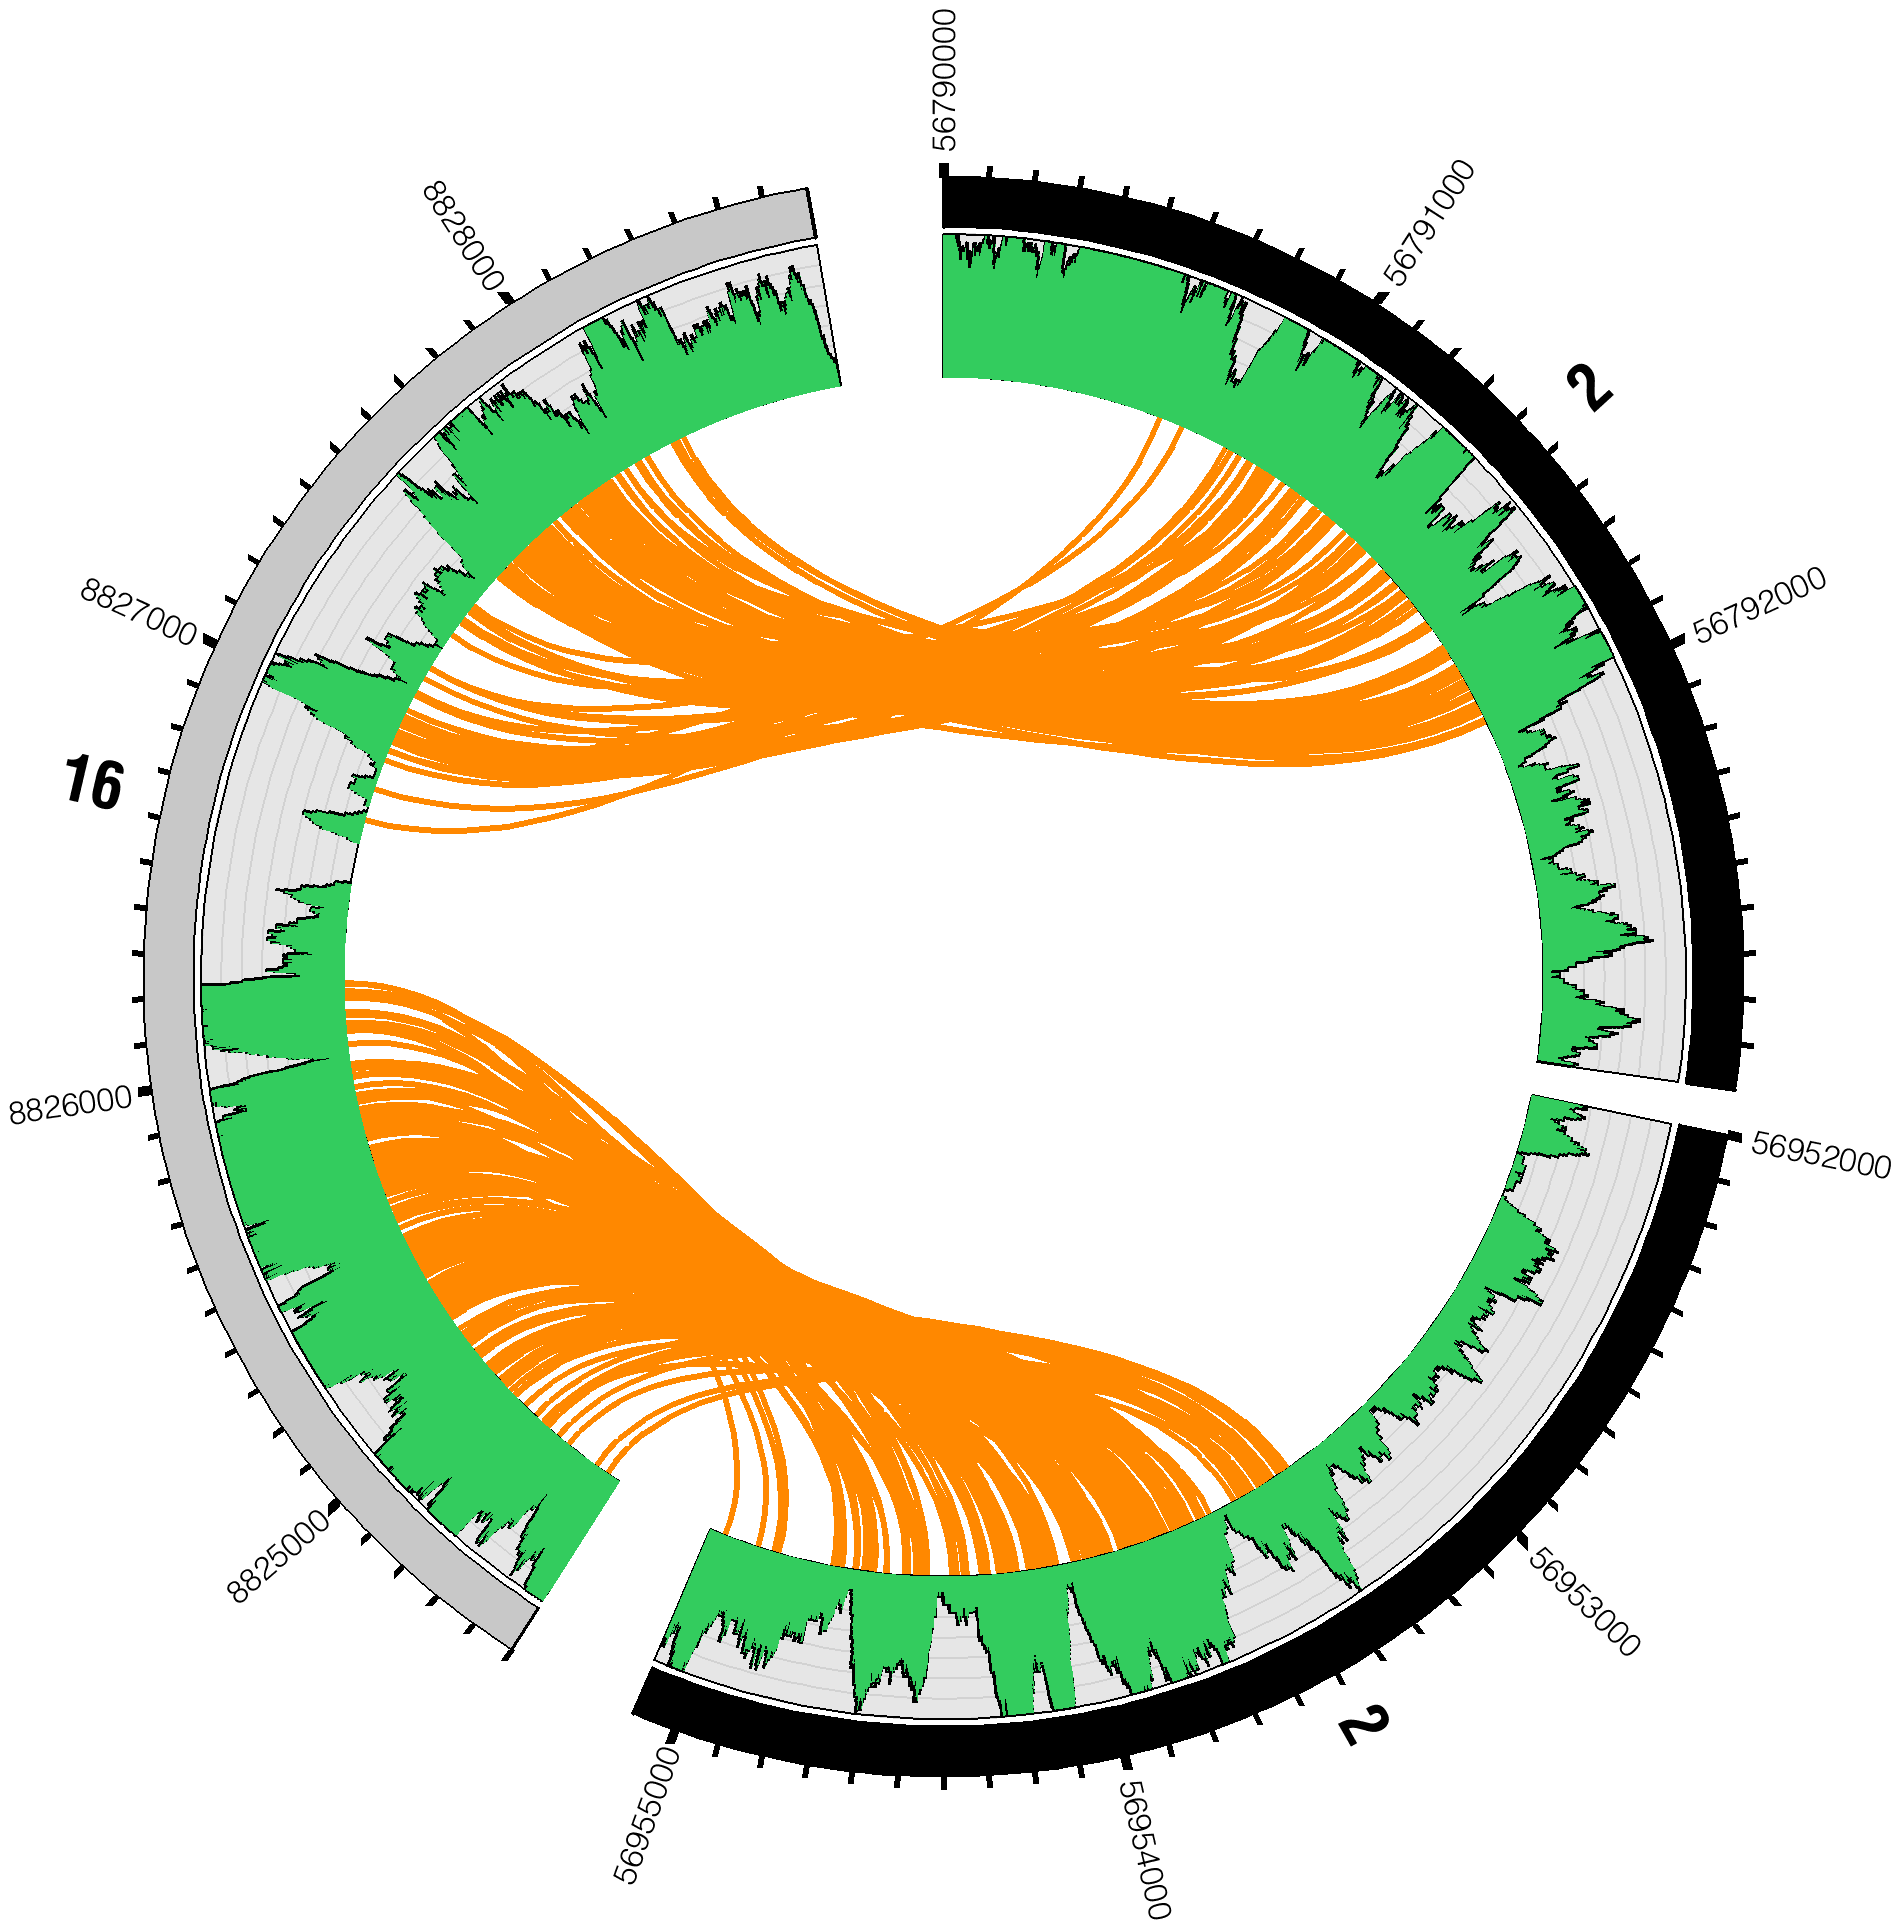 Reads spanning interchromosomal translocation breakpoints.